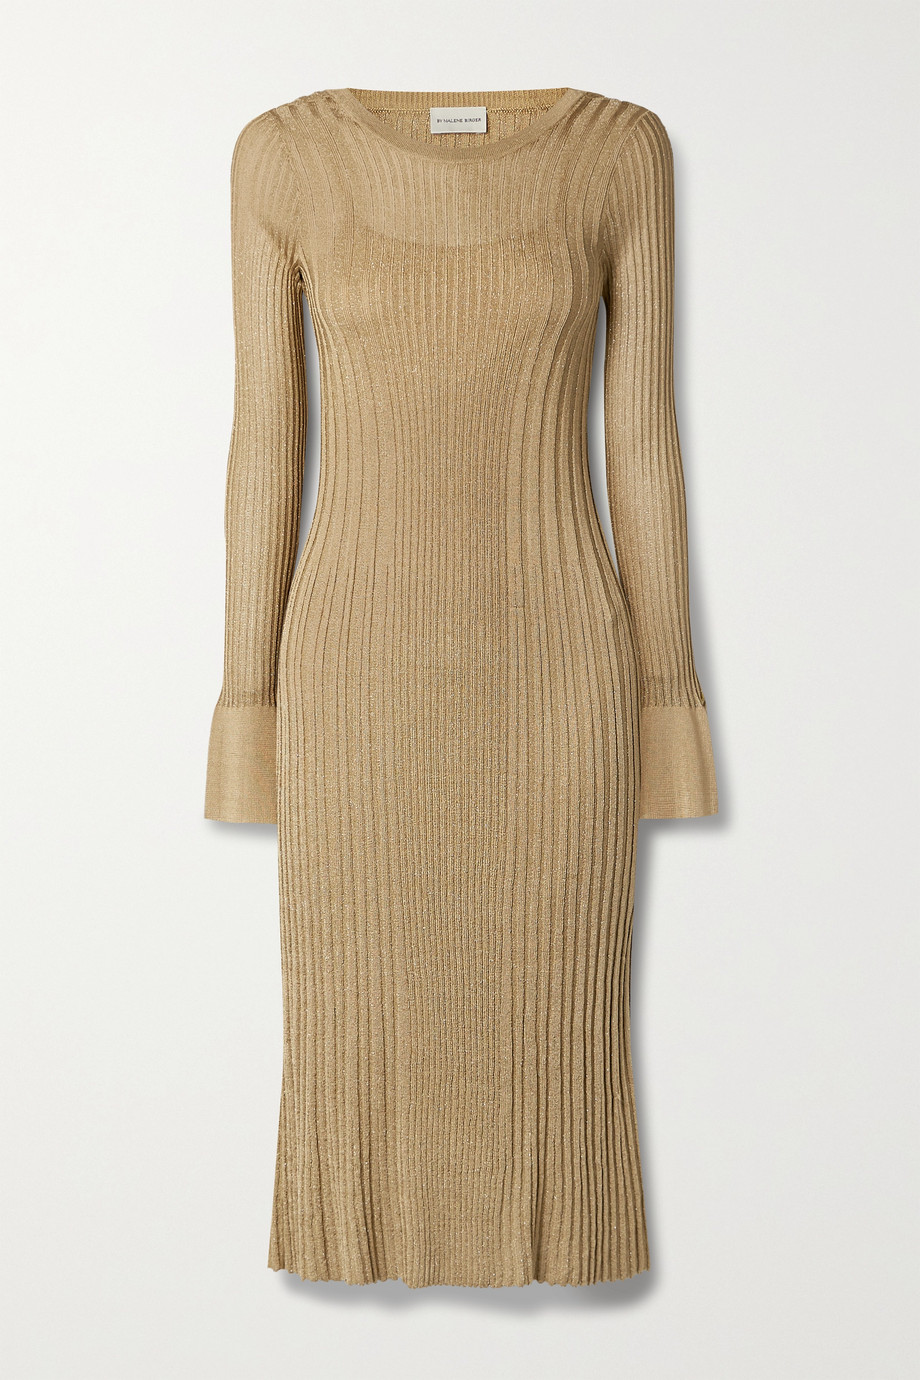 By Malene Birger Ophelias metallic ribbed-knit midi dress